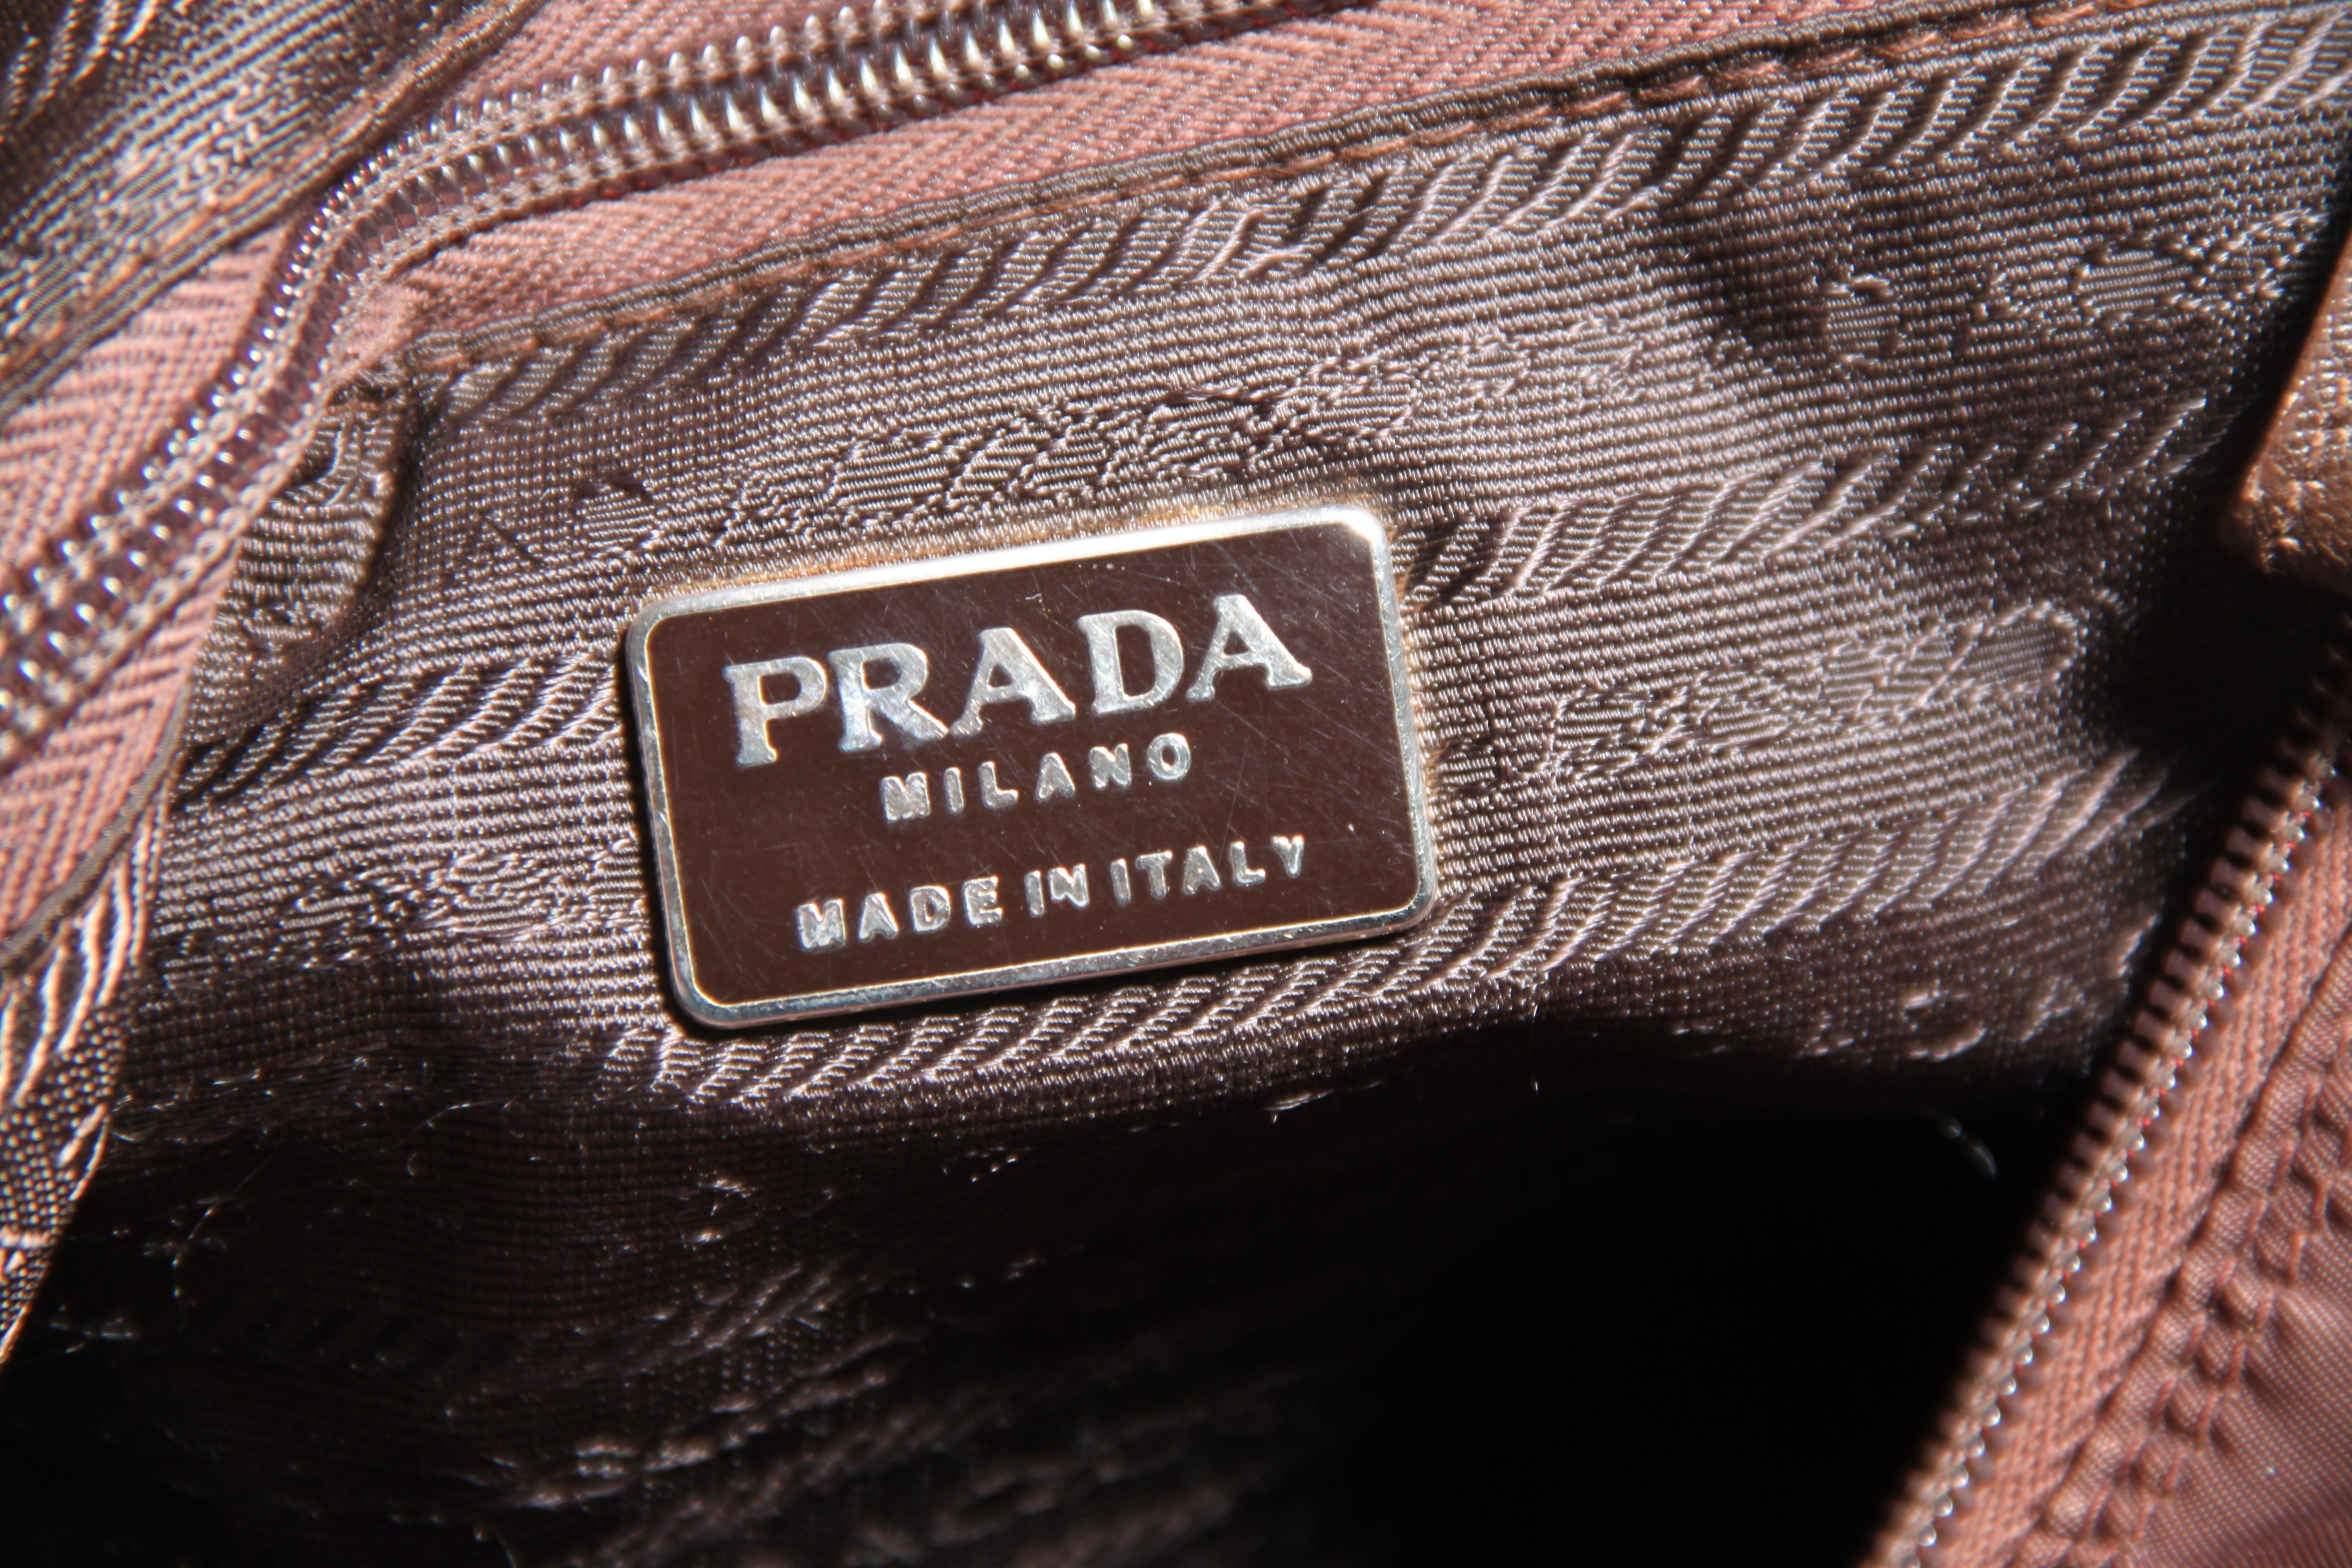 22b85d0ddd5540 Prada: logos, shapes and details , a close look - VintageMania